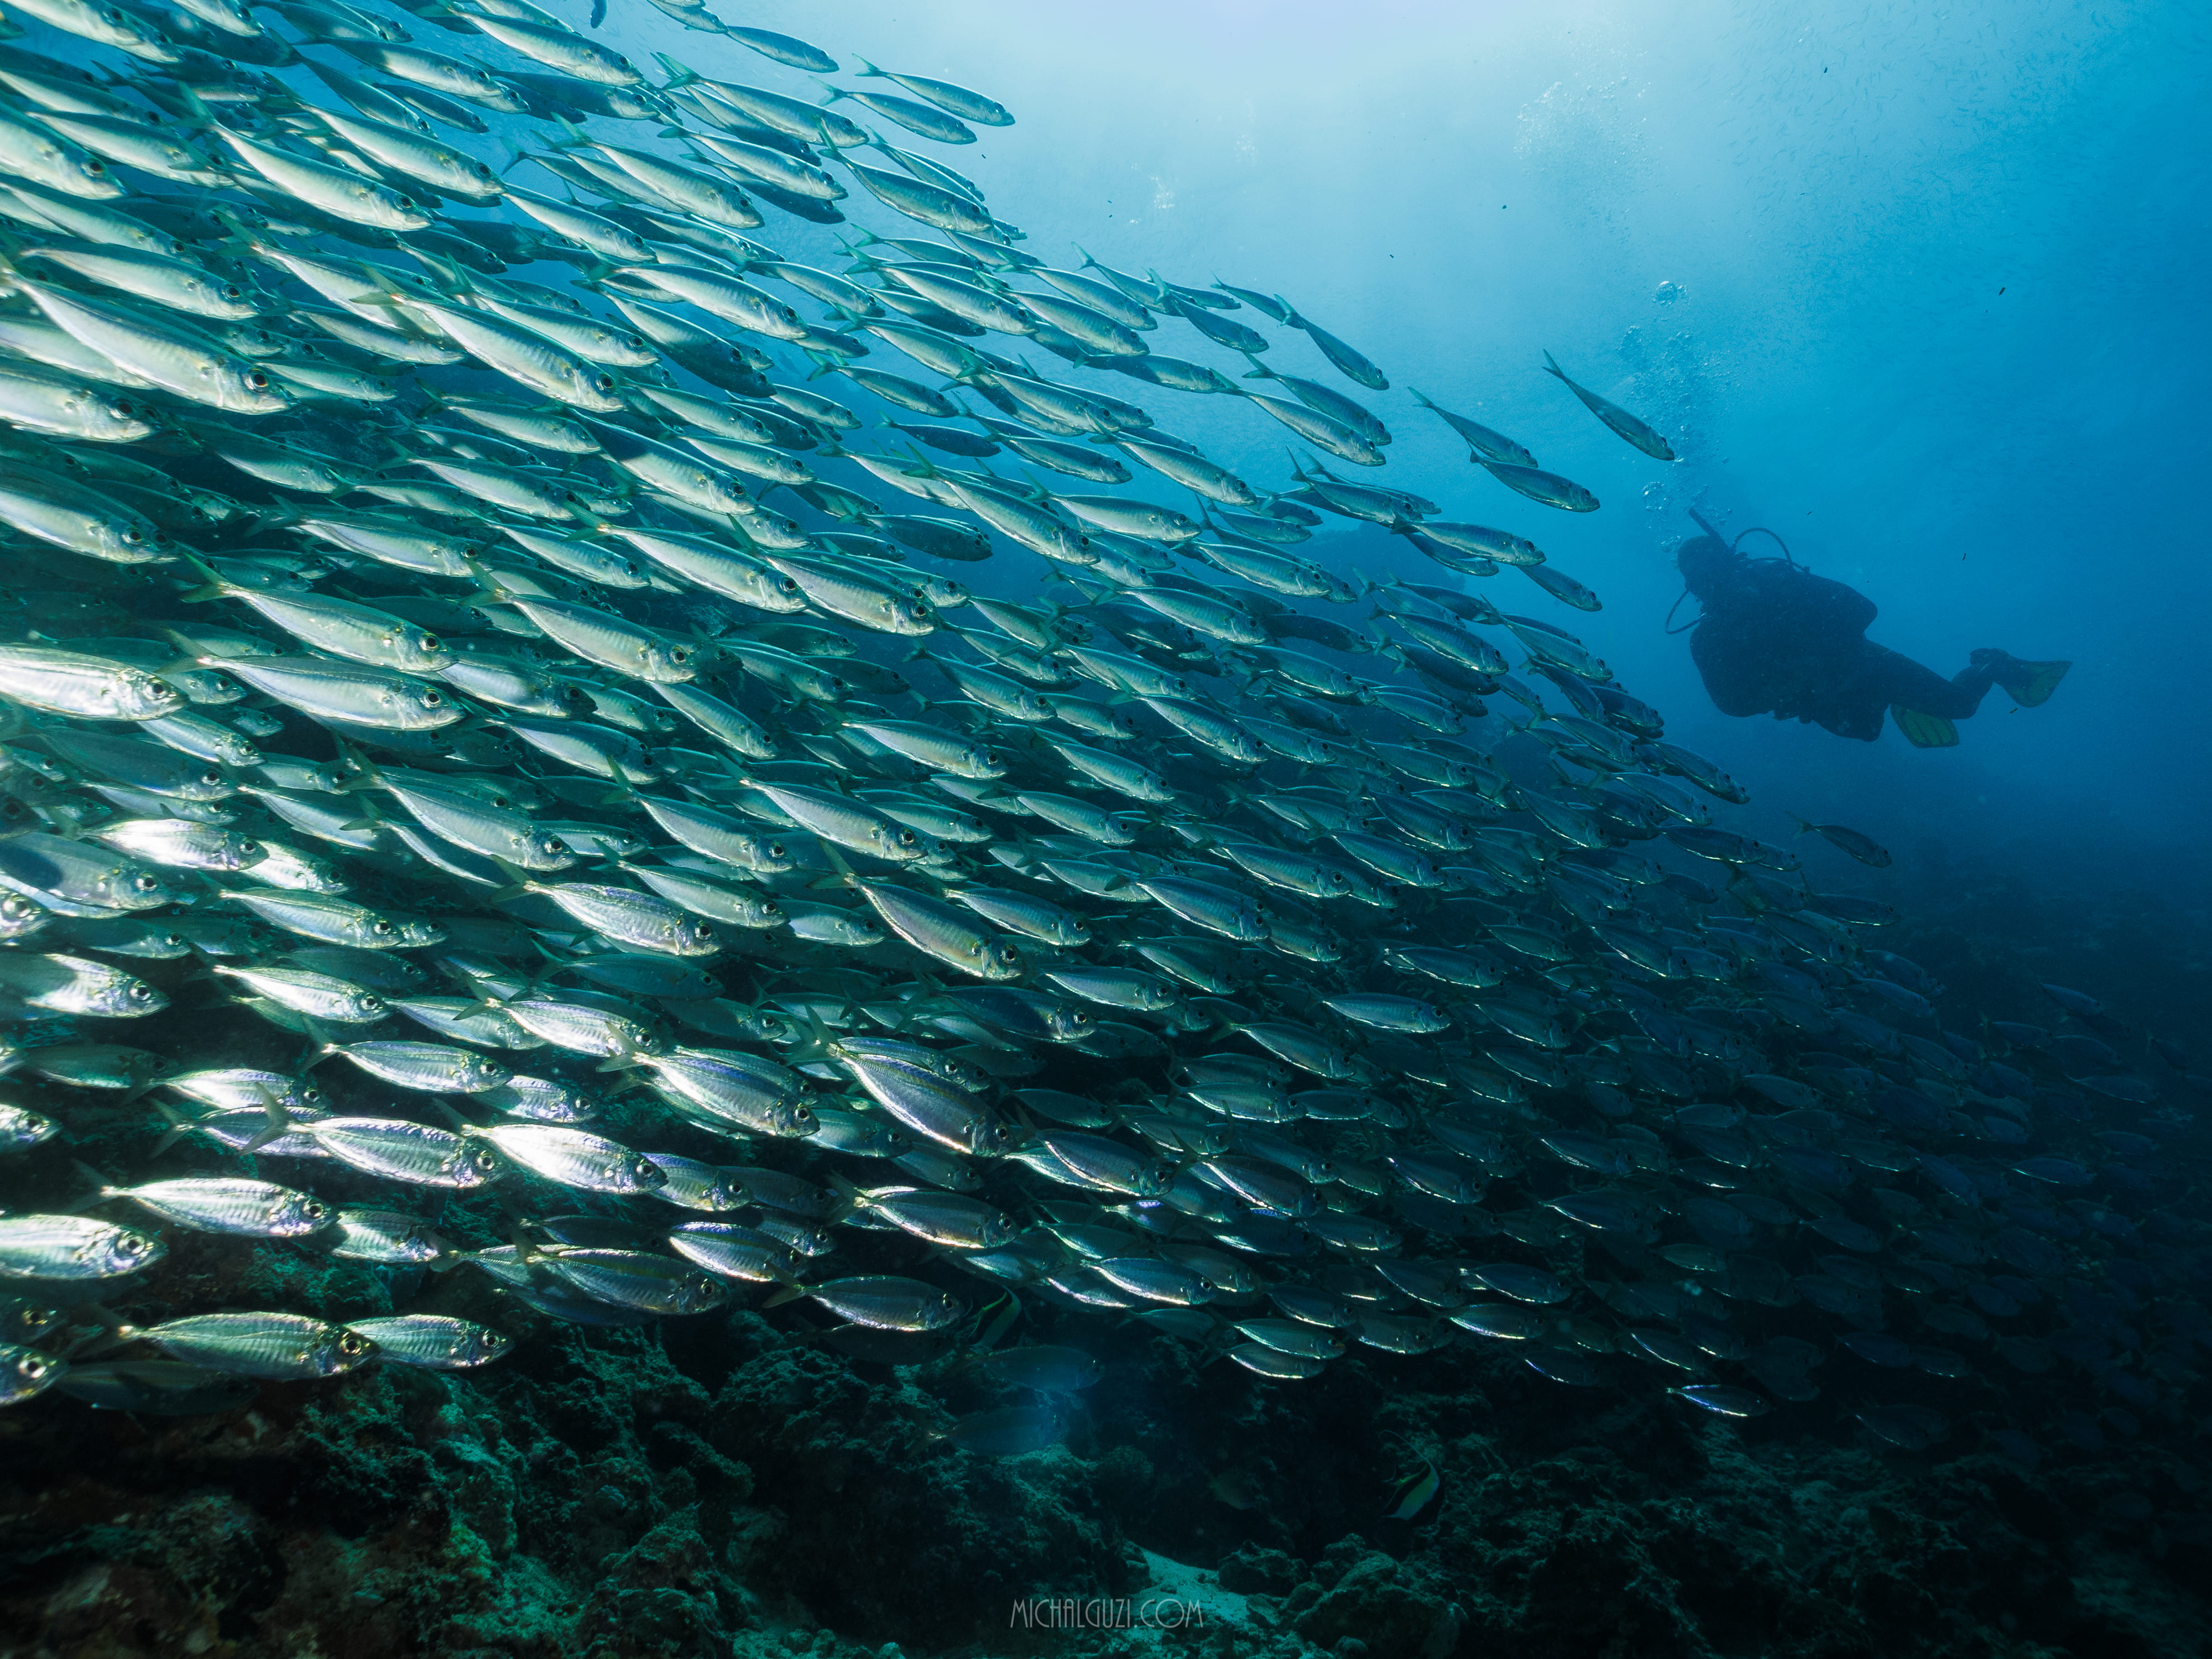 Sardine run experience in Moalboal